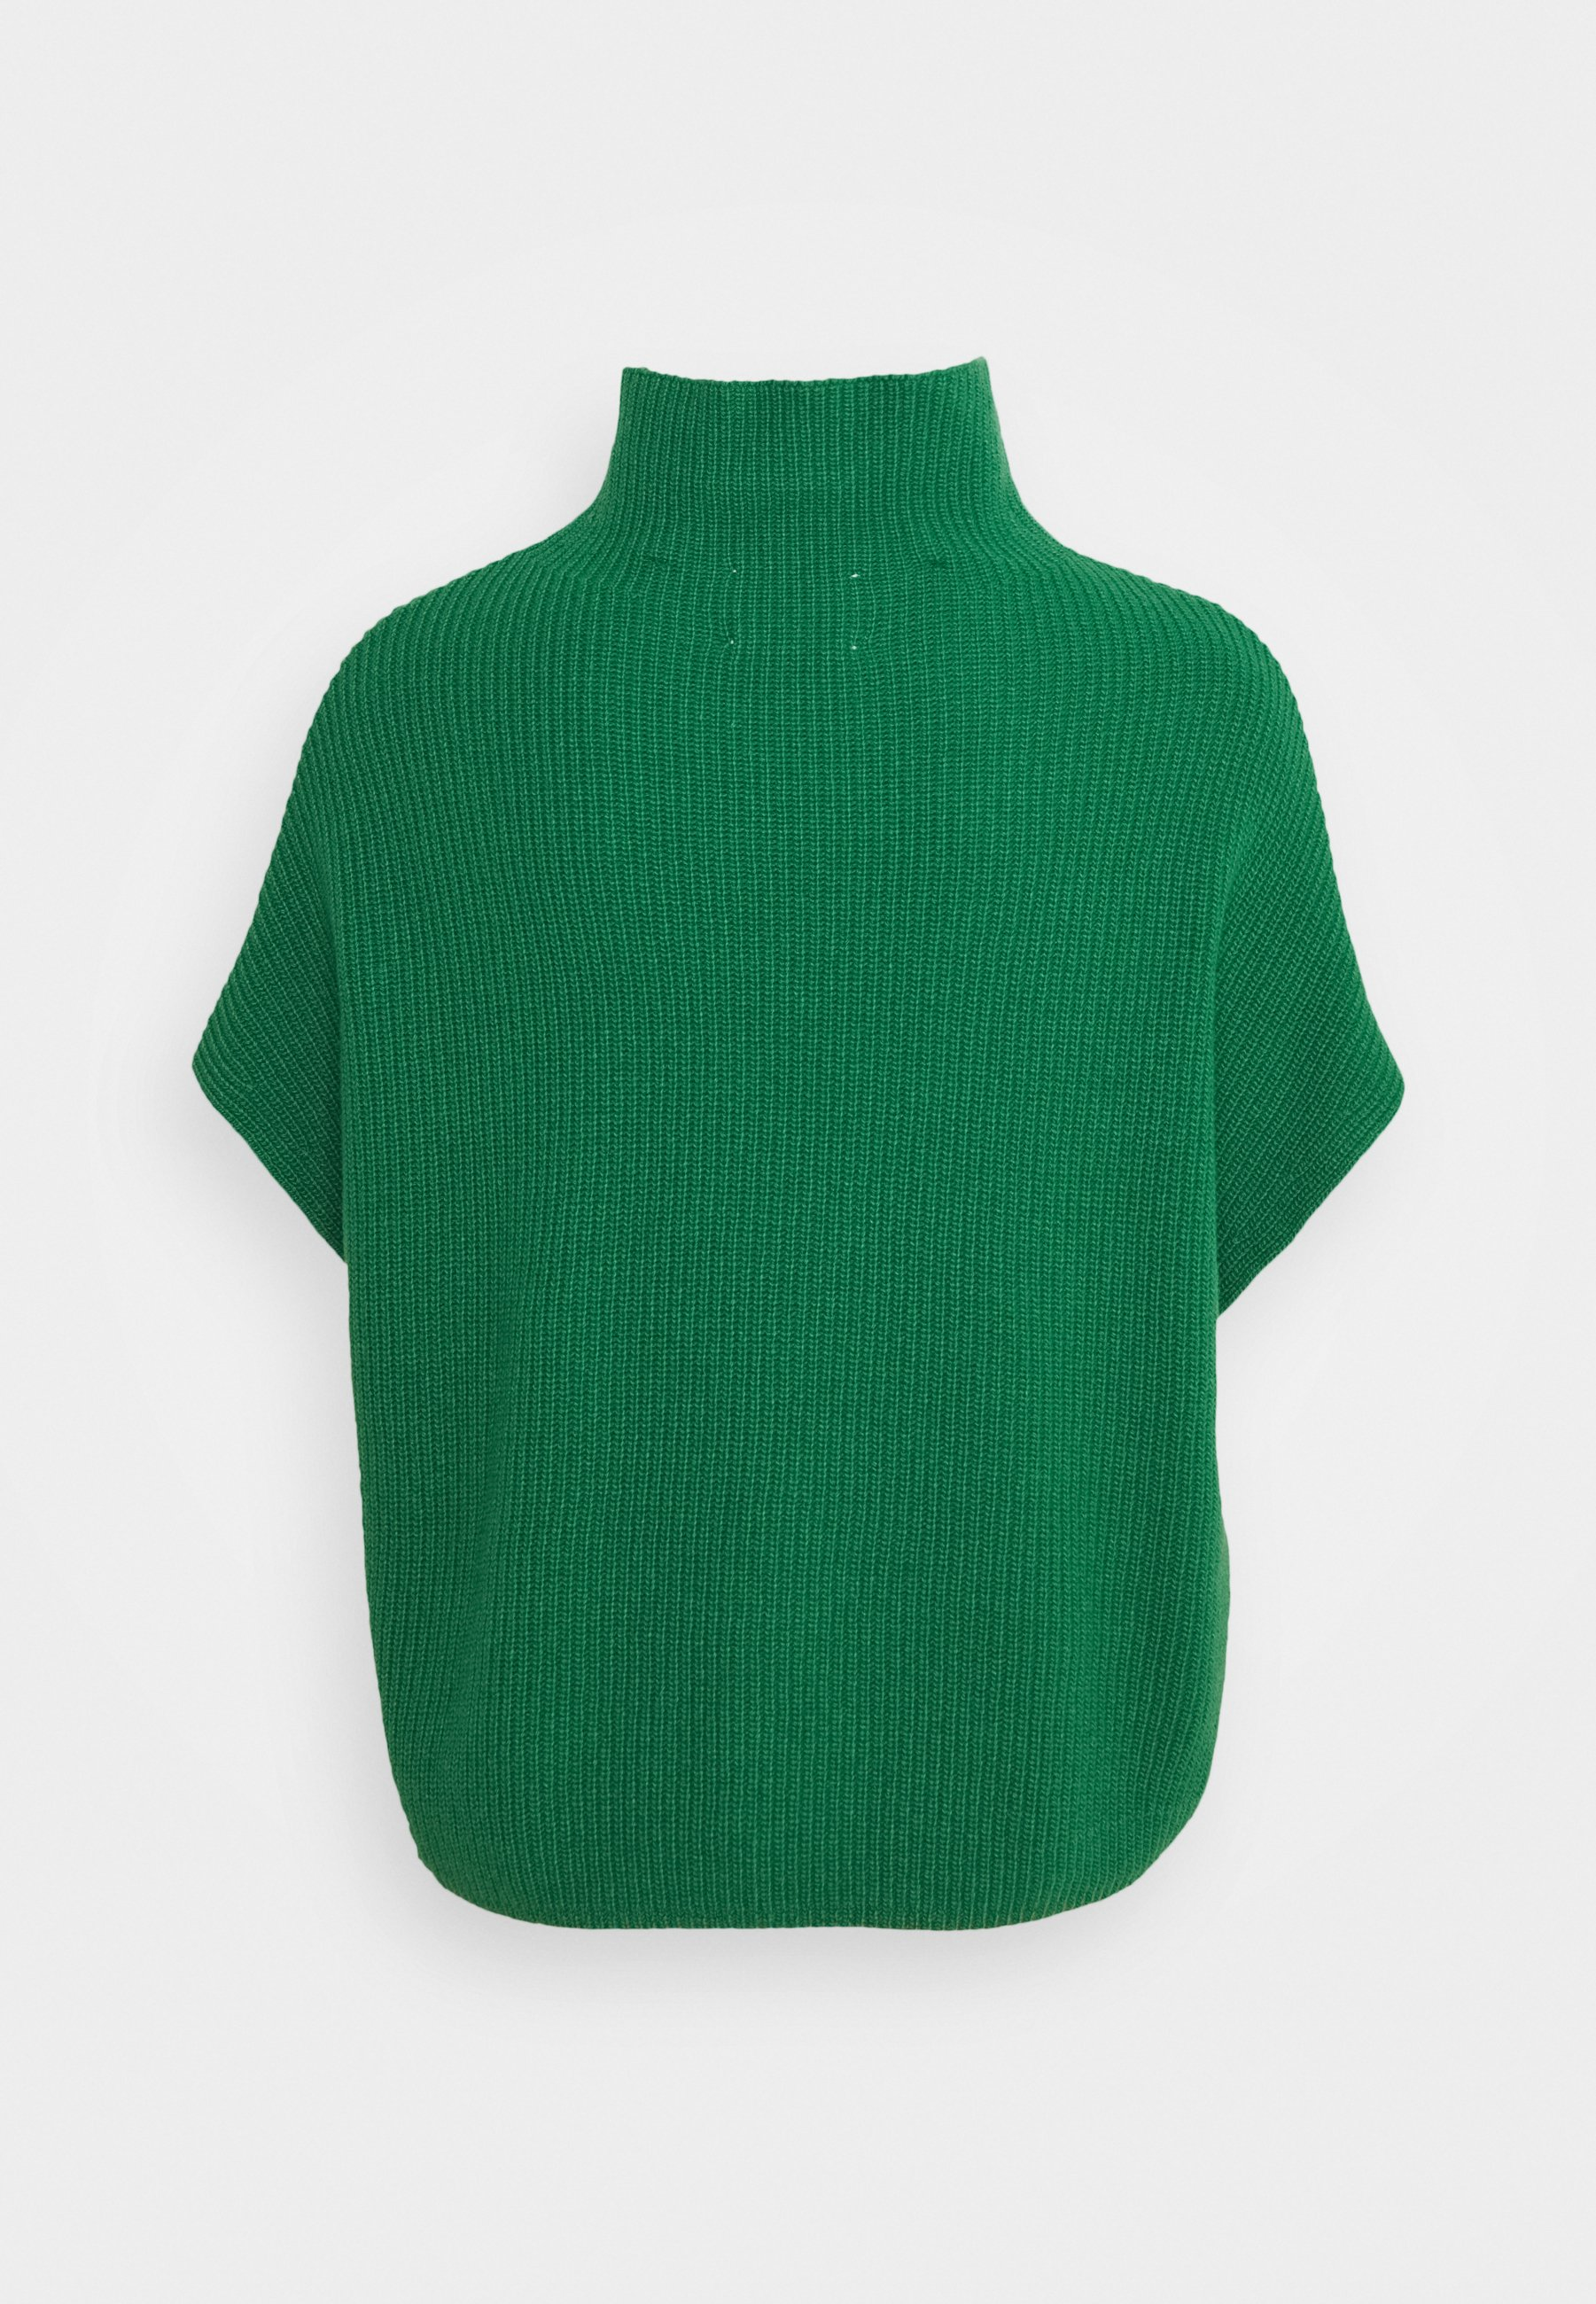 Marc O'polo Pure T-shirts - True Green/grønn